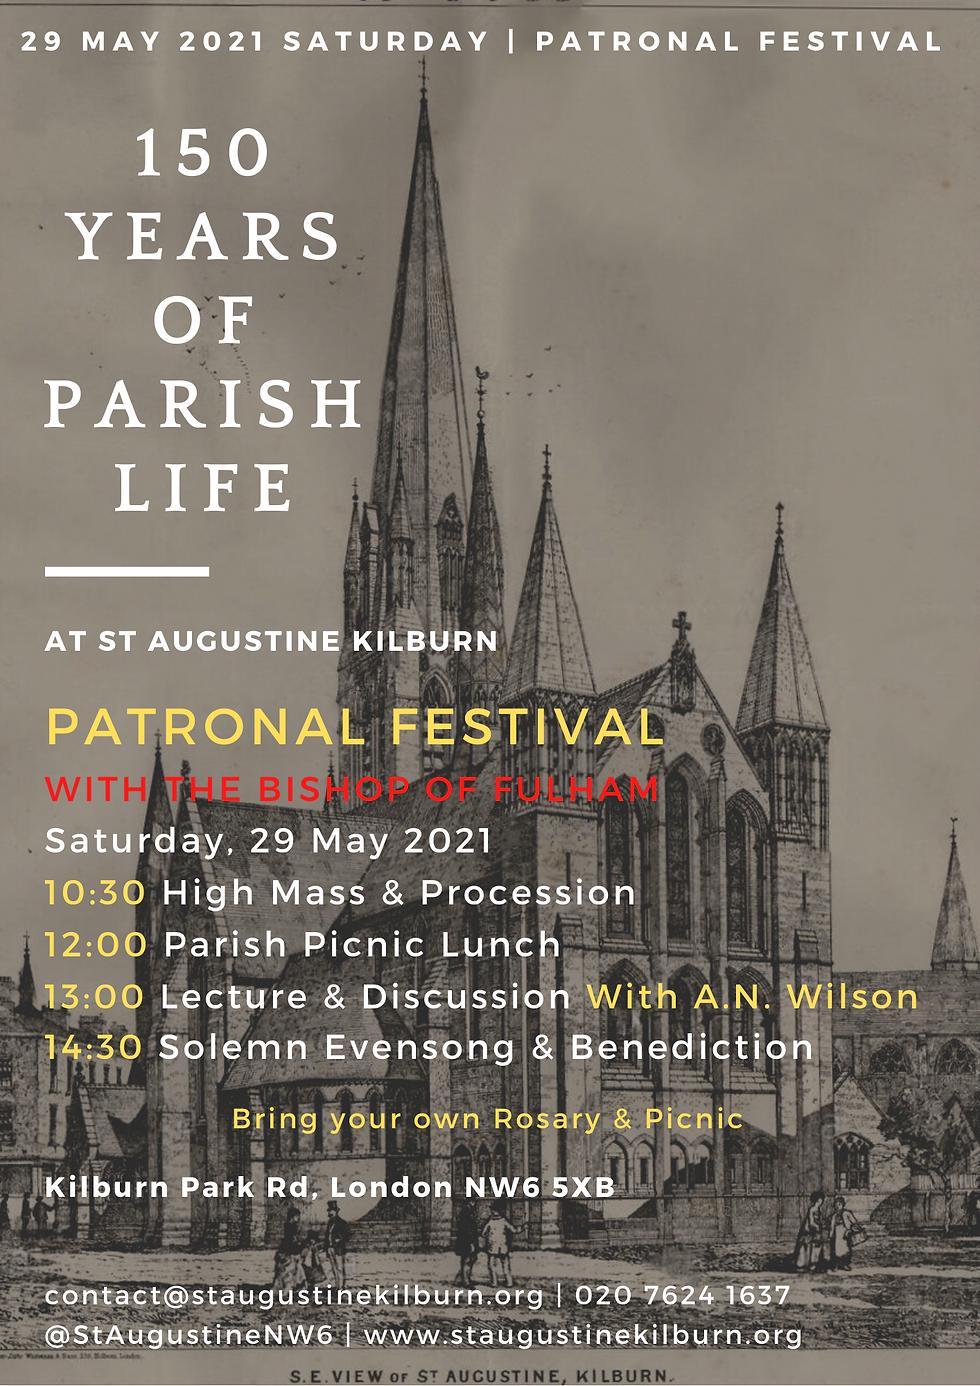 Patronal Festival 2021 - FLYER.png